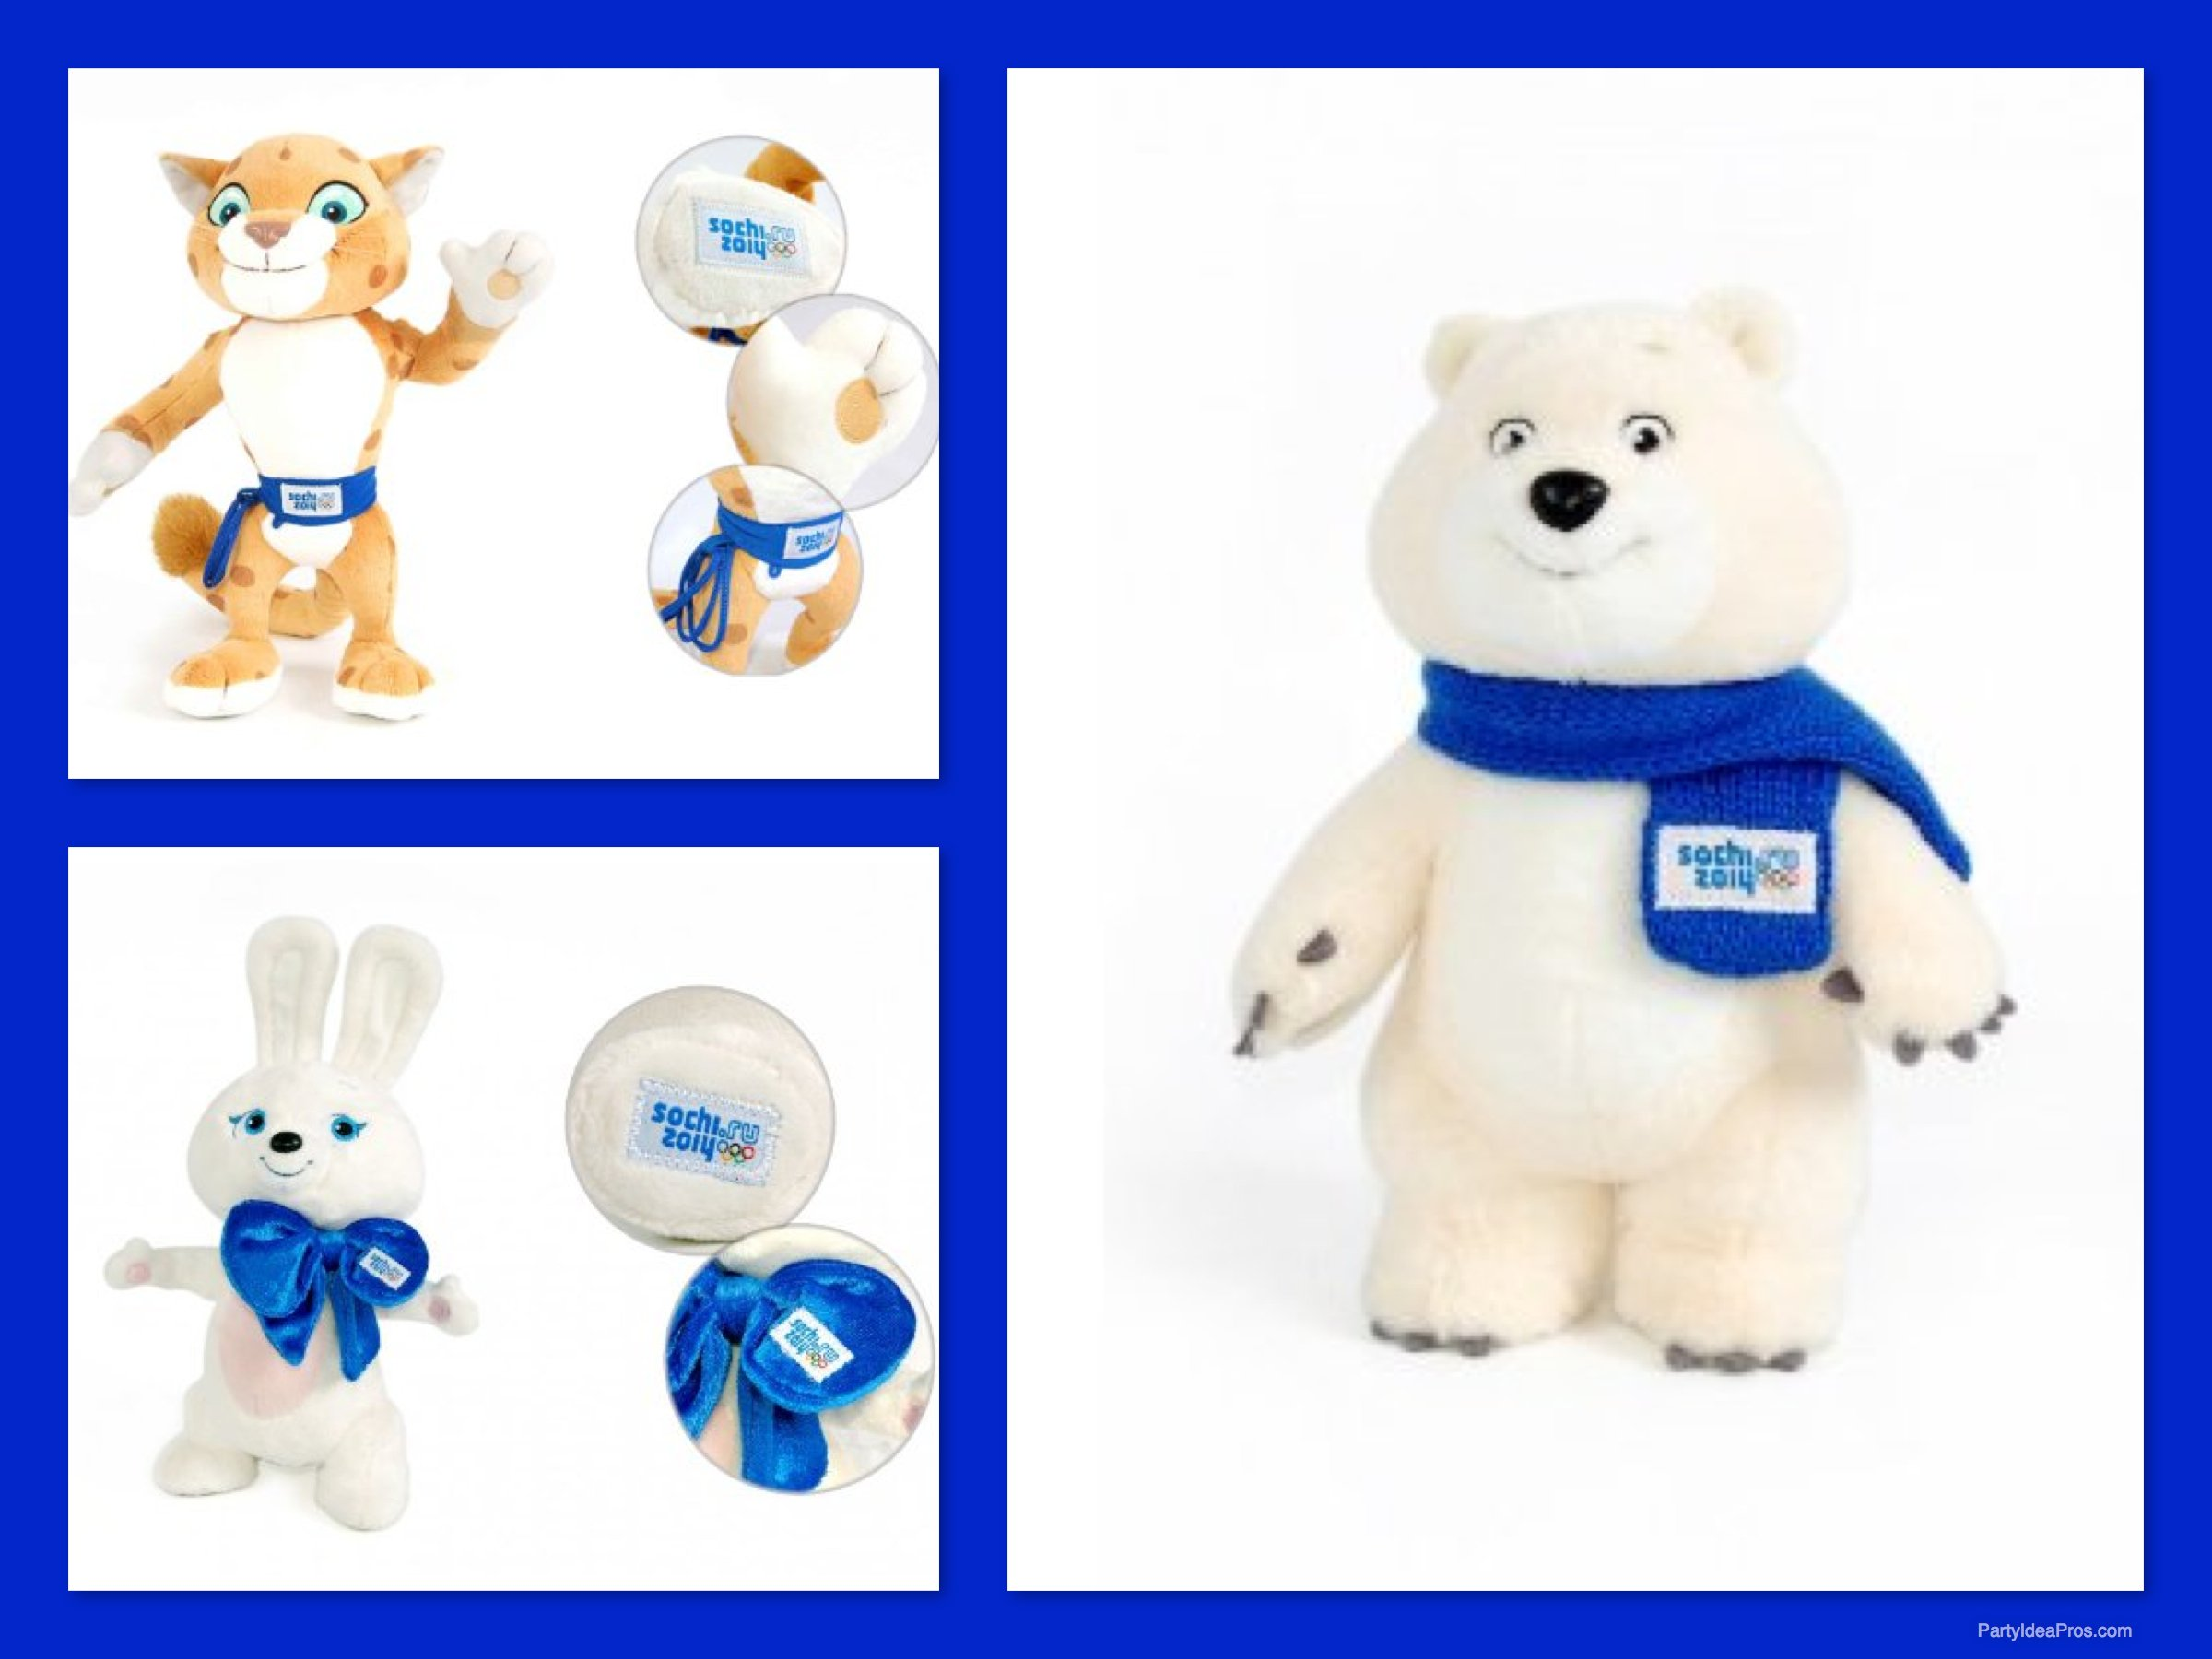 Winter Olympics 2014 Sochi Mascots